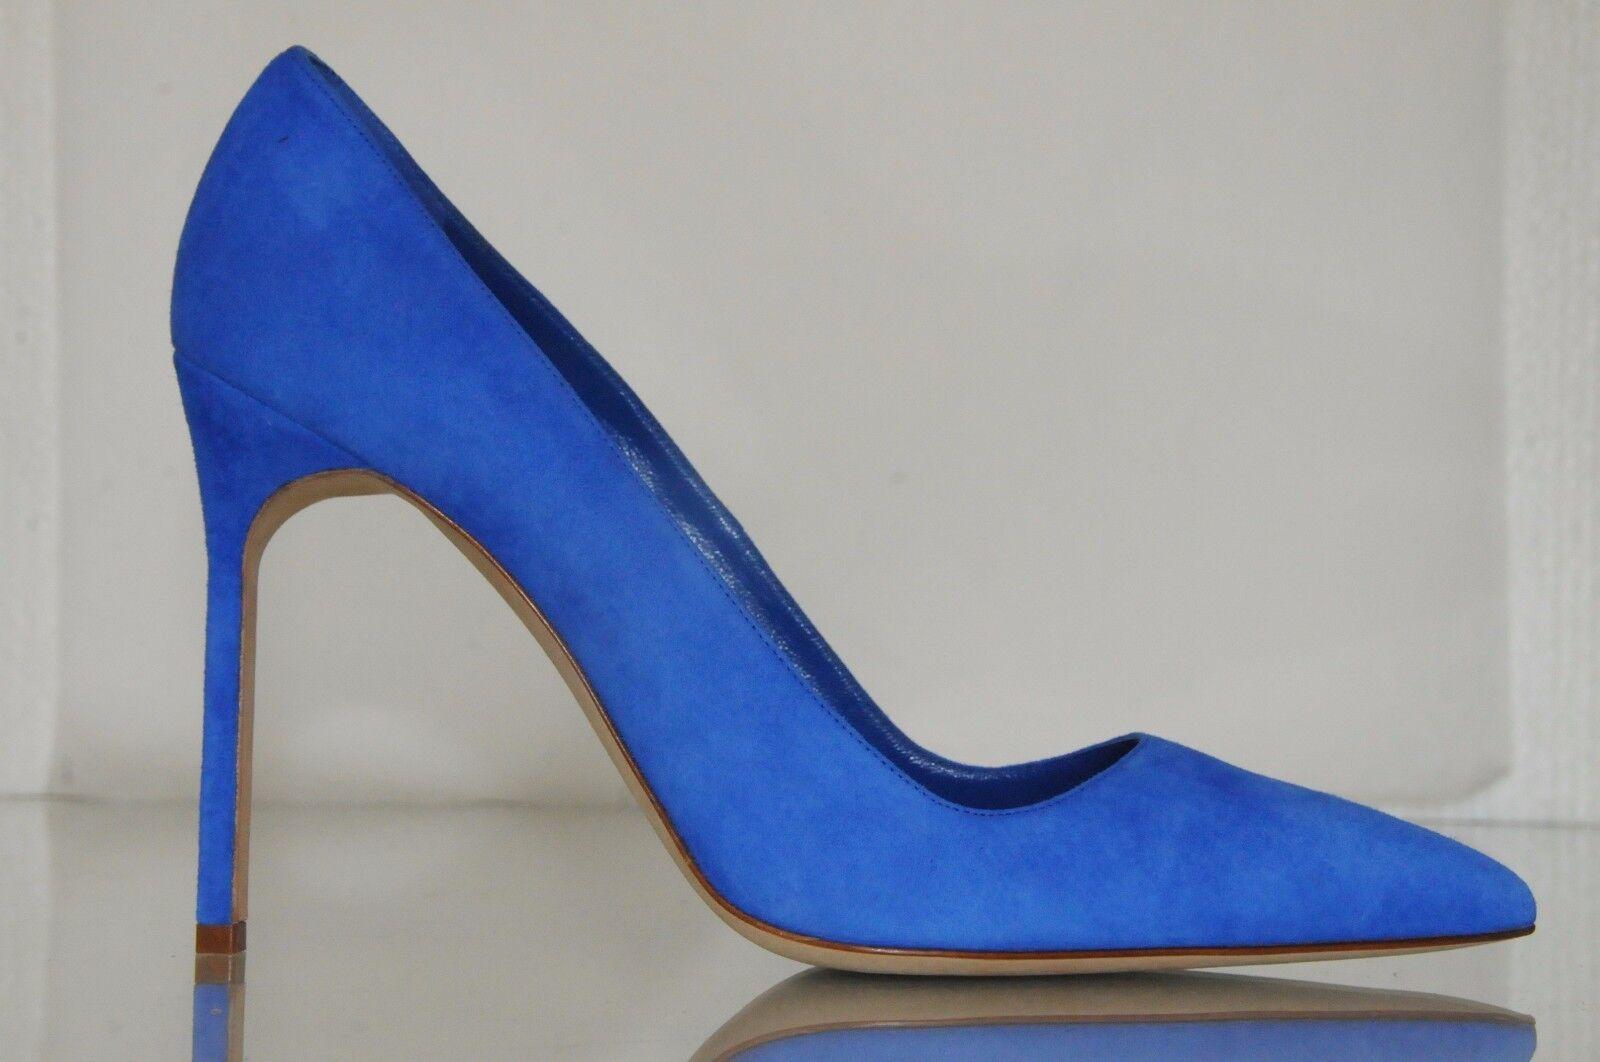 Neuf Manolo Blahnik Bb 105 Bleu Cobalt Mariage Chaussures Daim Talons 40.5 41.5 Mariage Cobalt d3cec2